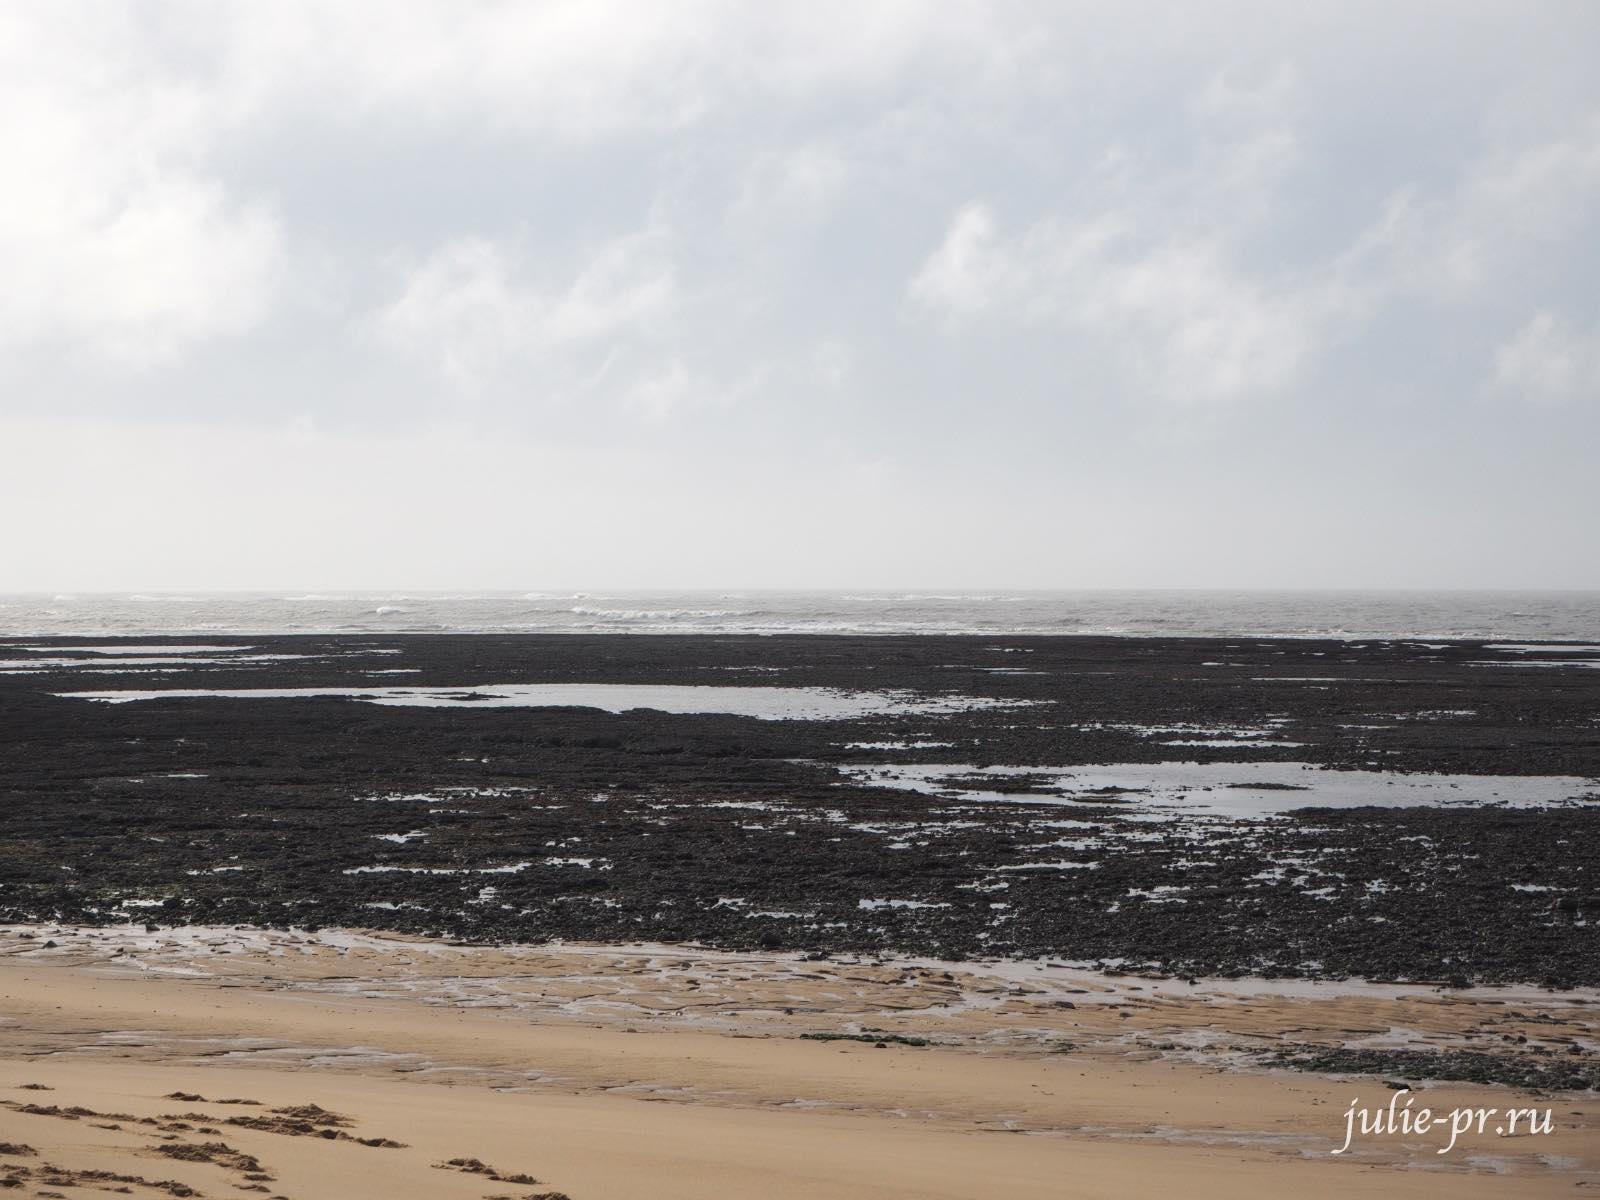 Франция, остров Олерон, пляж мата, plage de Matha, Атлантический океан